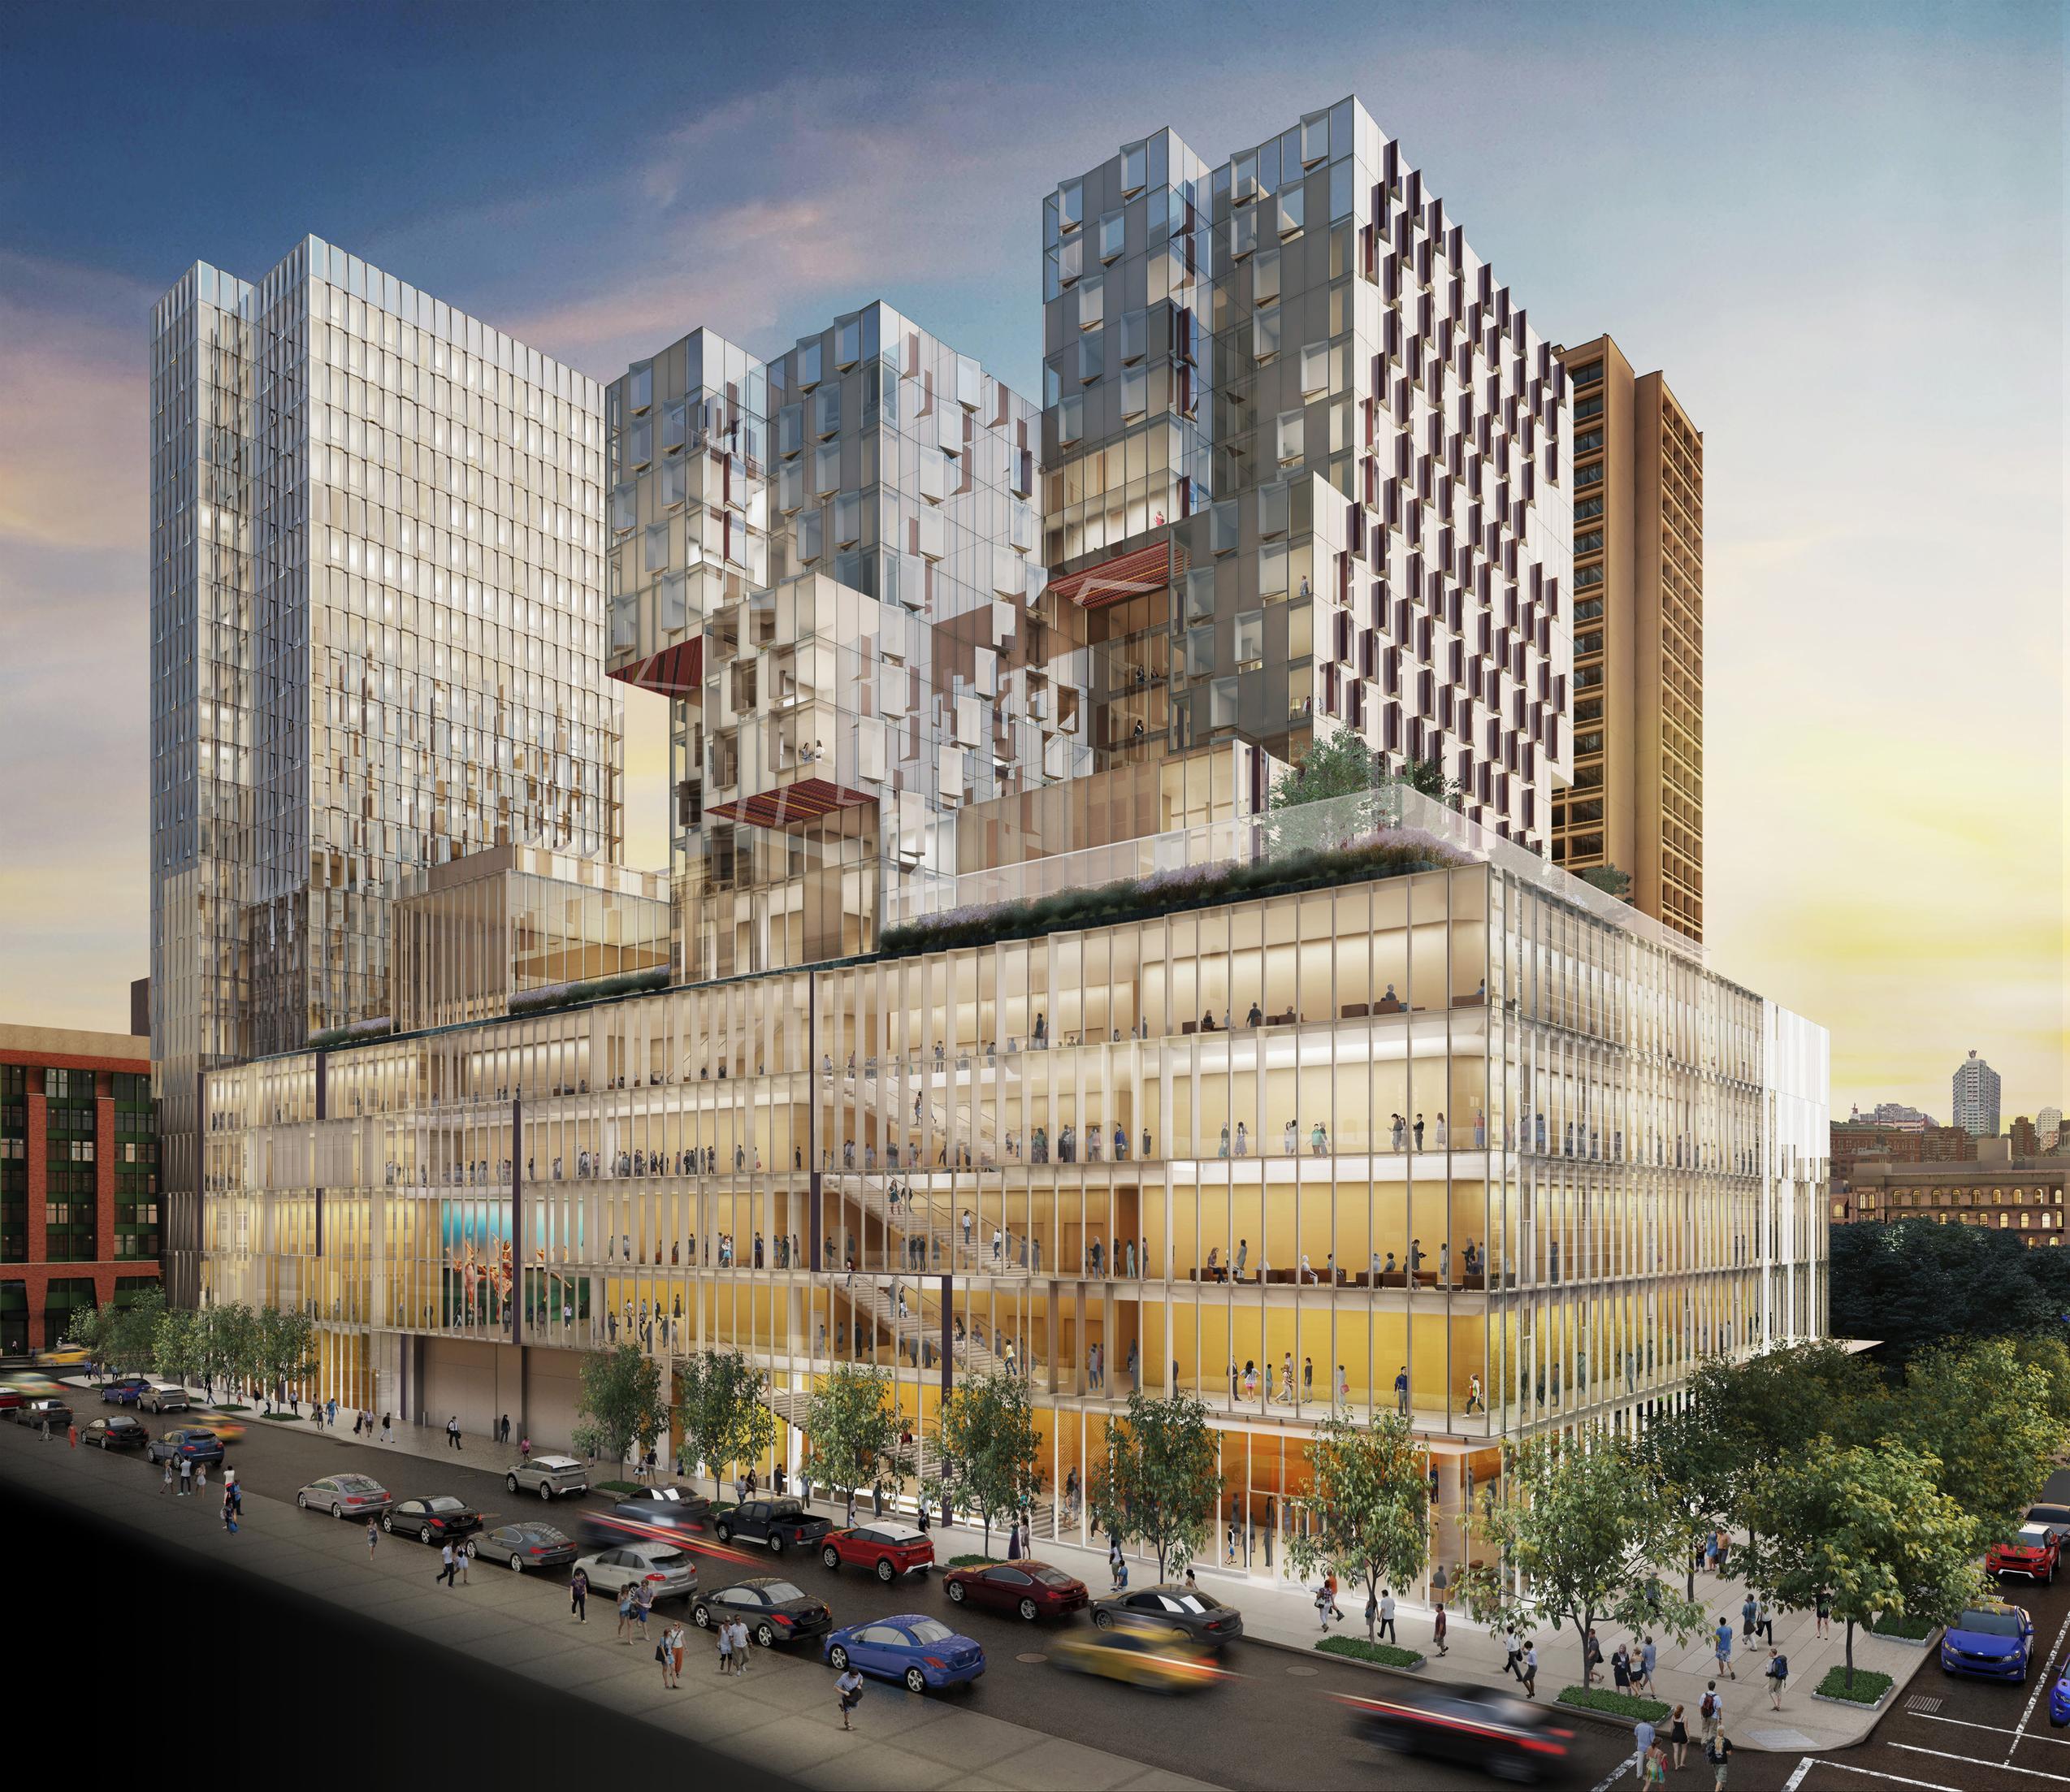 NYU Expansion at 181 Mercer, rendering via StudioAMD